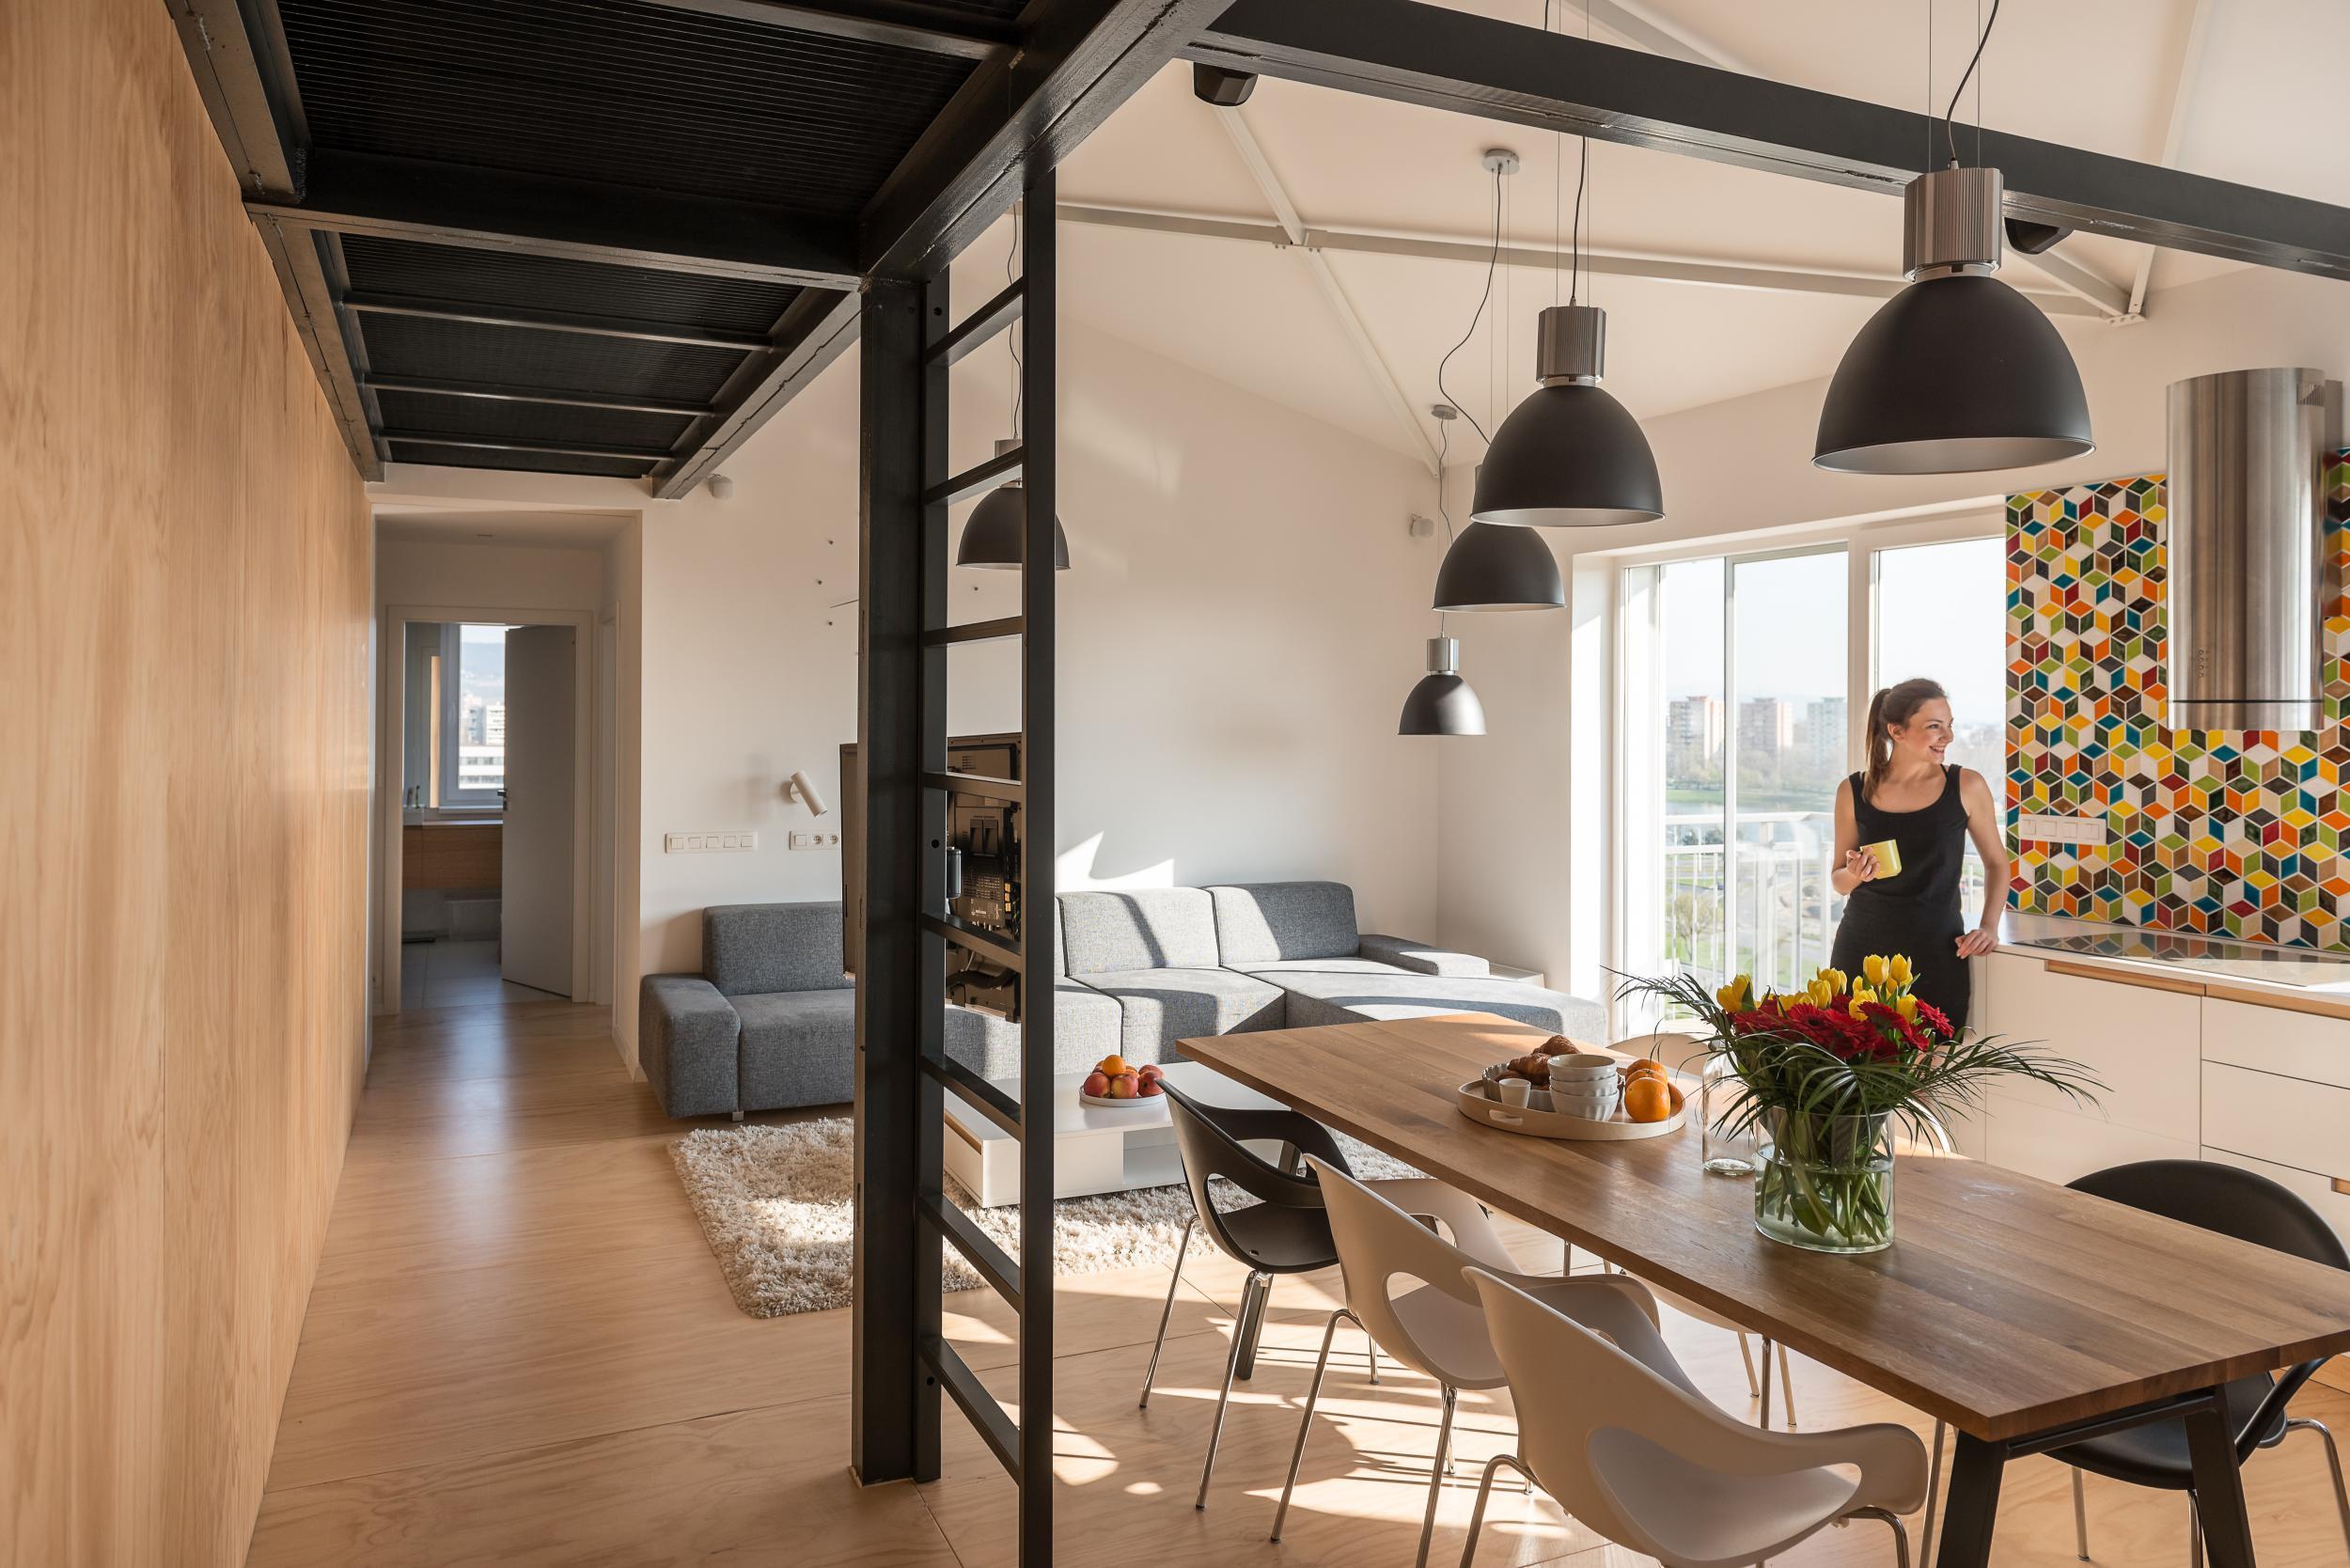 Loft apartment in superstructure, Bratislava, Slovakia | RULES ...